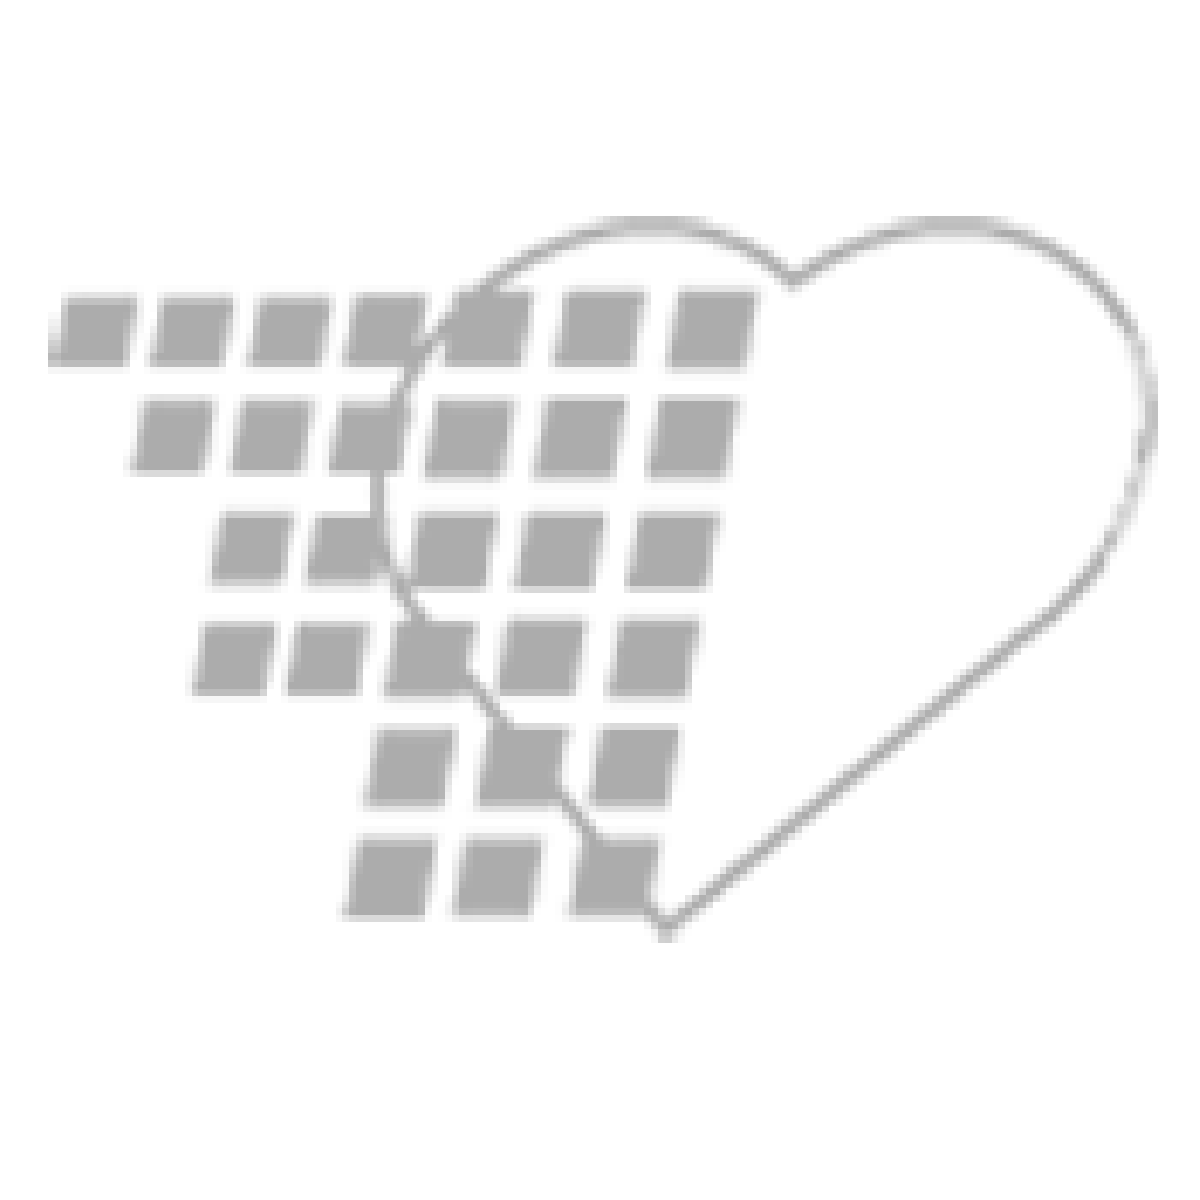 11-81-0946 Nasco Life/form® Non-Pitting Edema Trainer